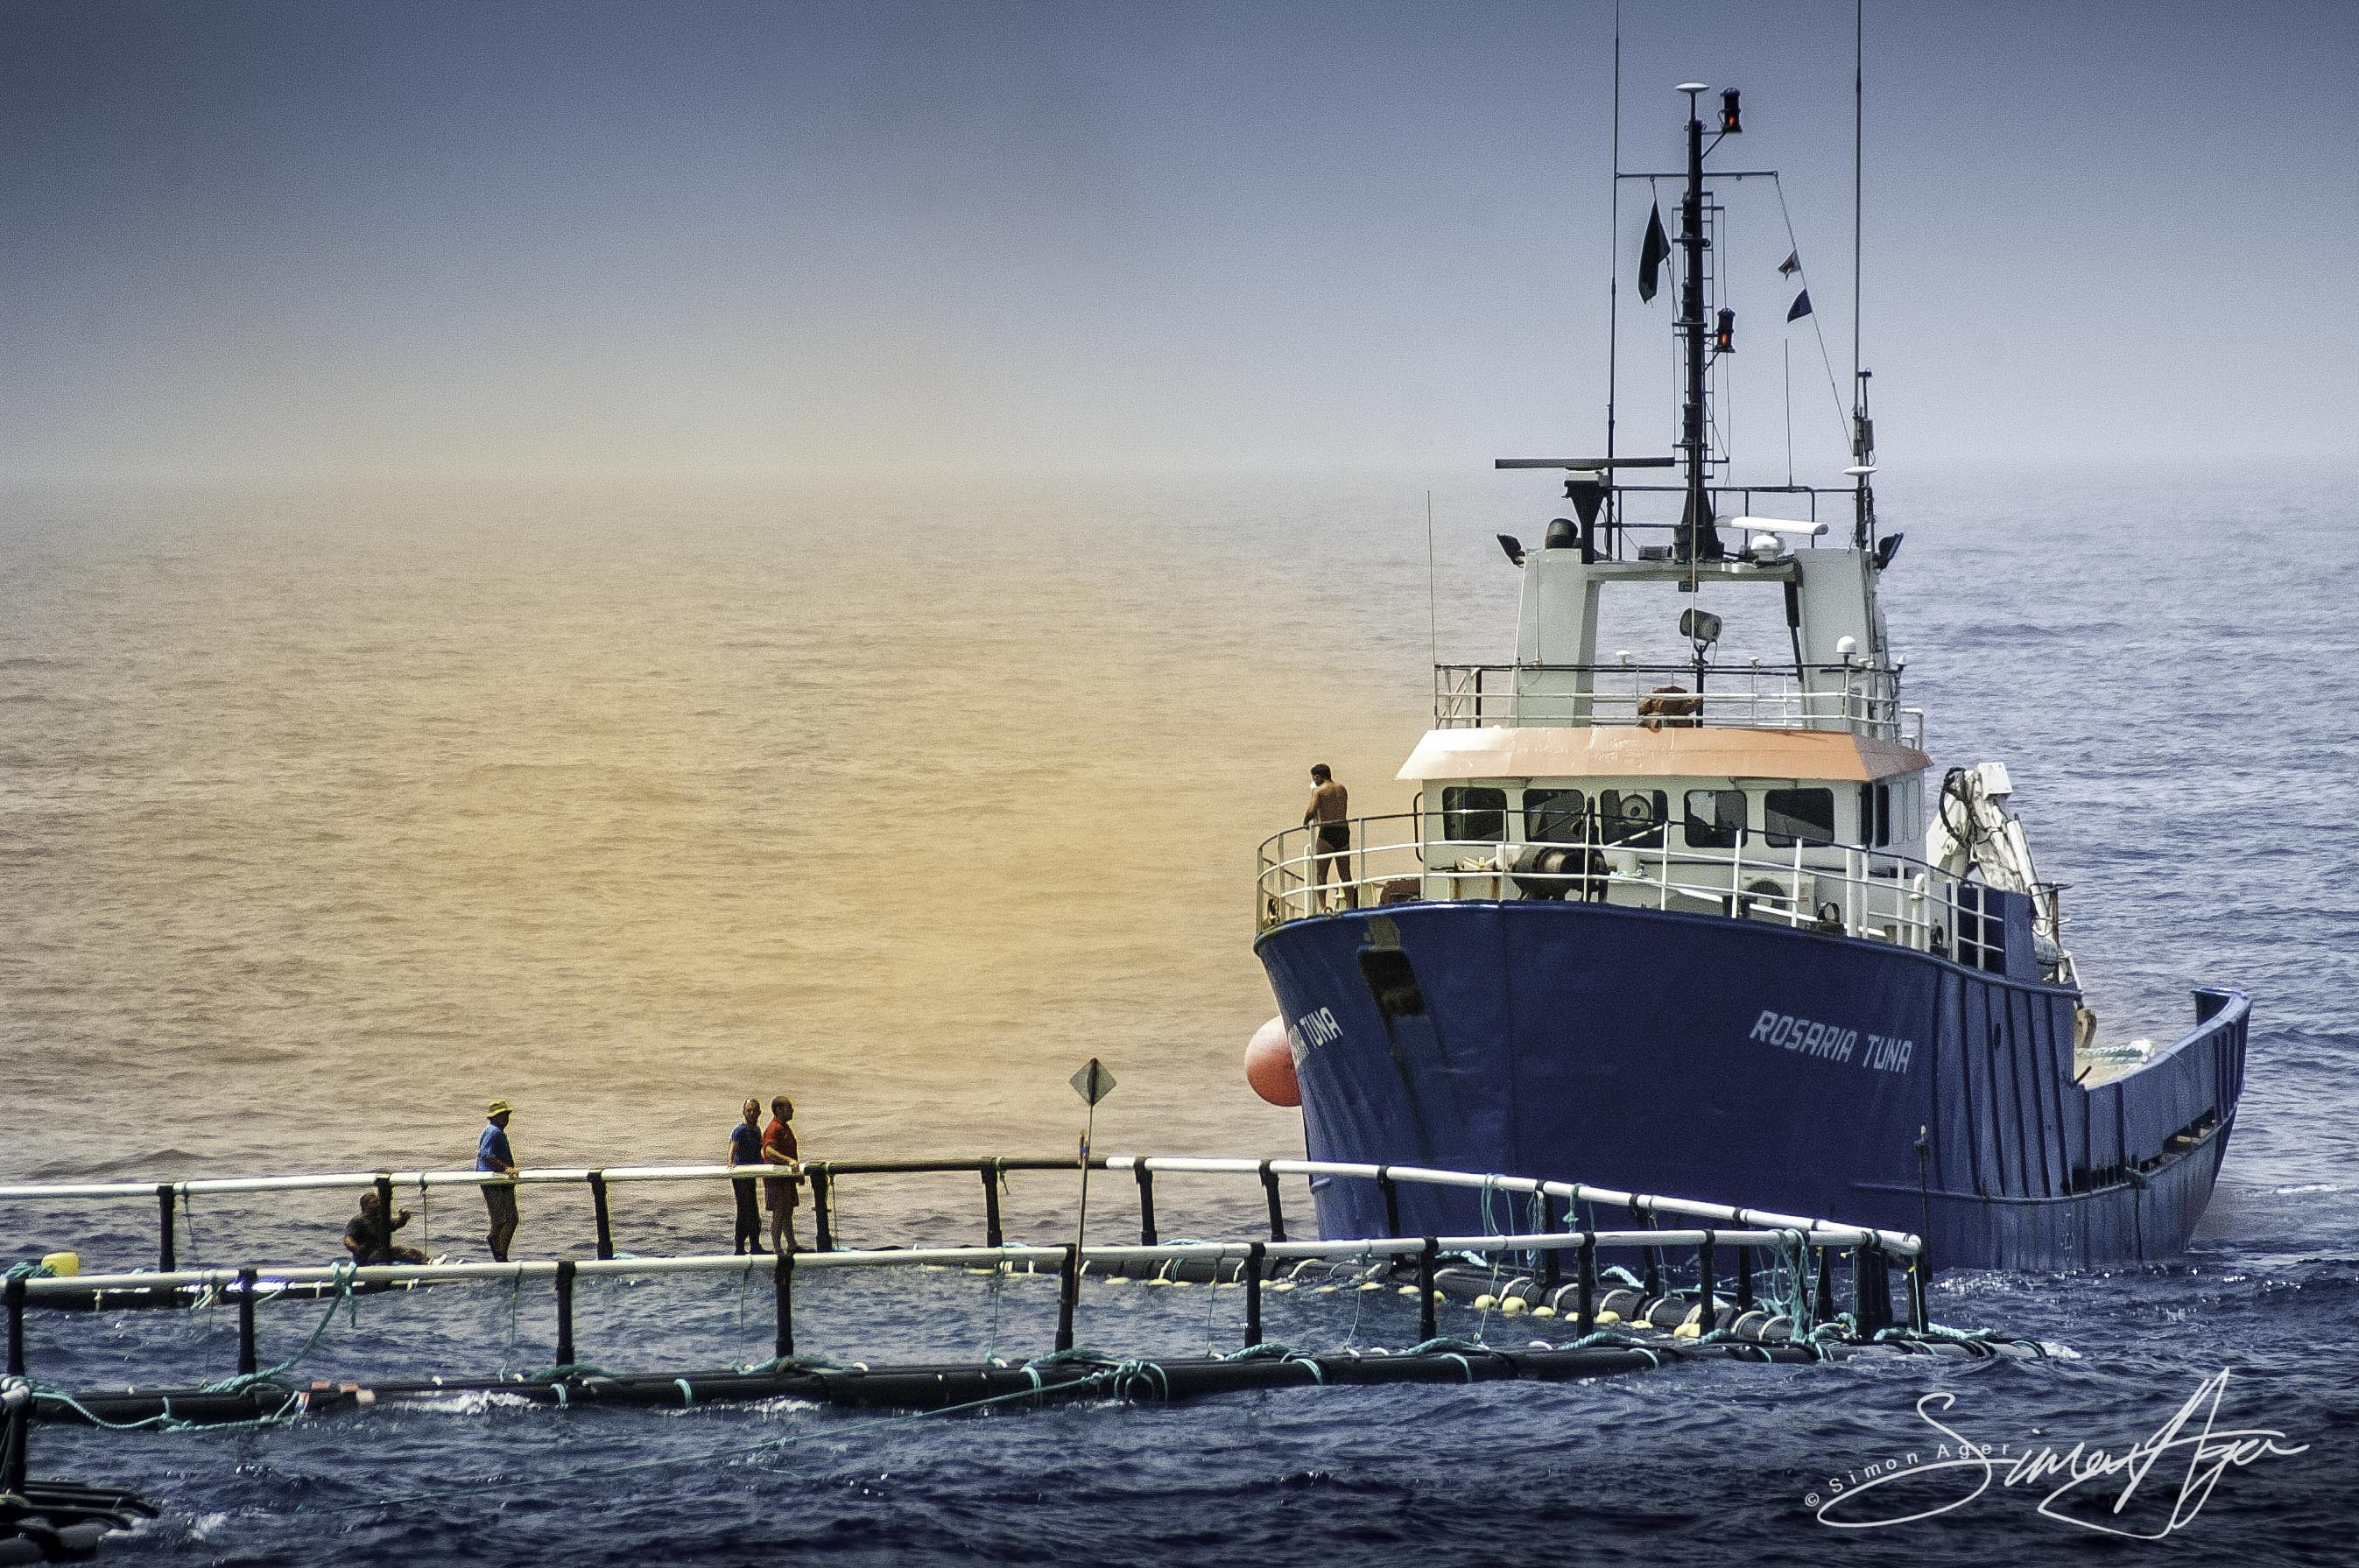 SA Libya Libyan Waters Sea Shepherd Releasing Bluefin Tuna Rosaria  cage Smoke Grenade 009 2266-Edit